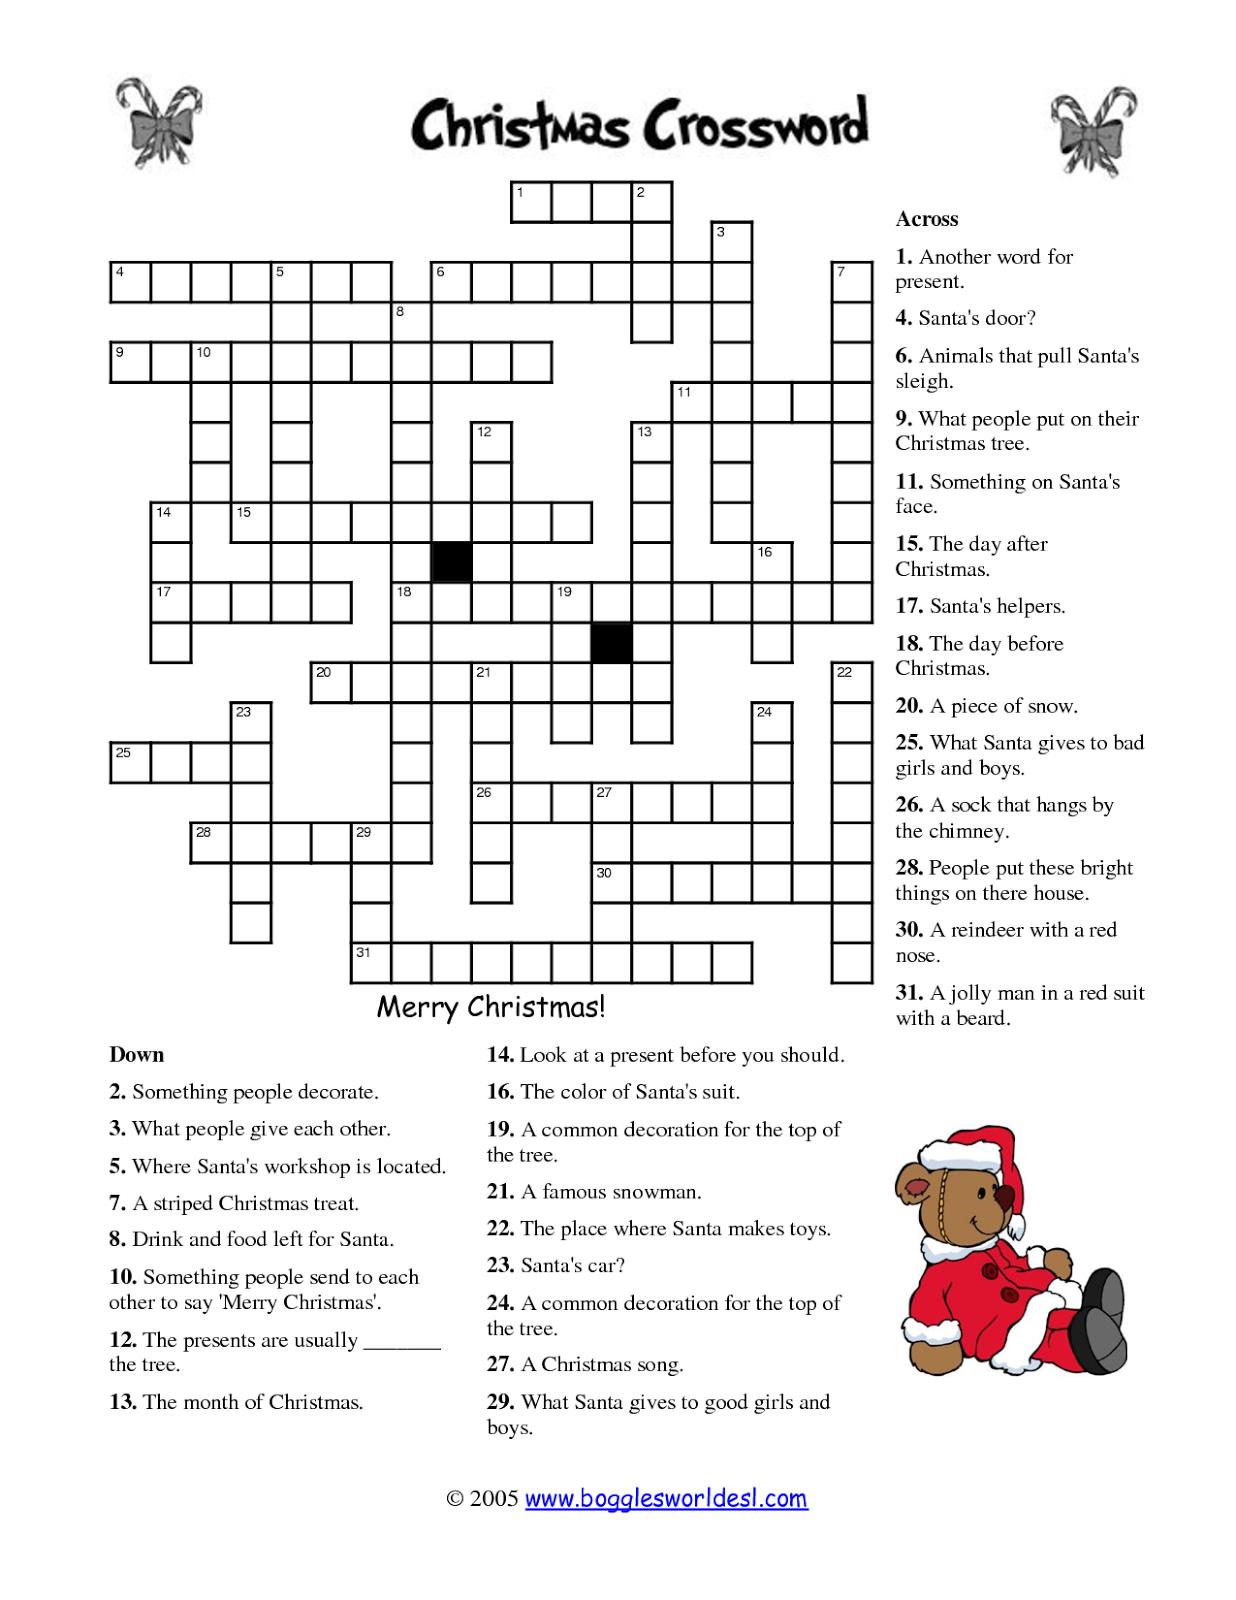 Free Printable Cards: Free Printable Crossword Puzzles | Christmas - Free Printable Christmas Puzzles